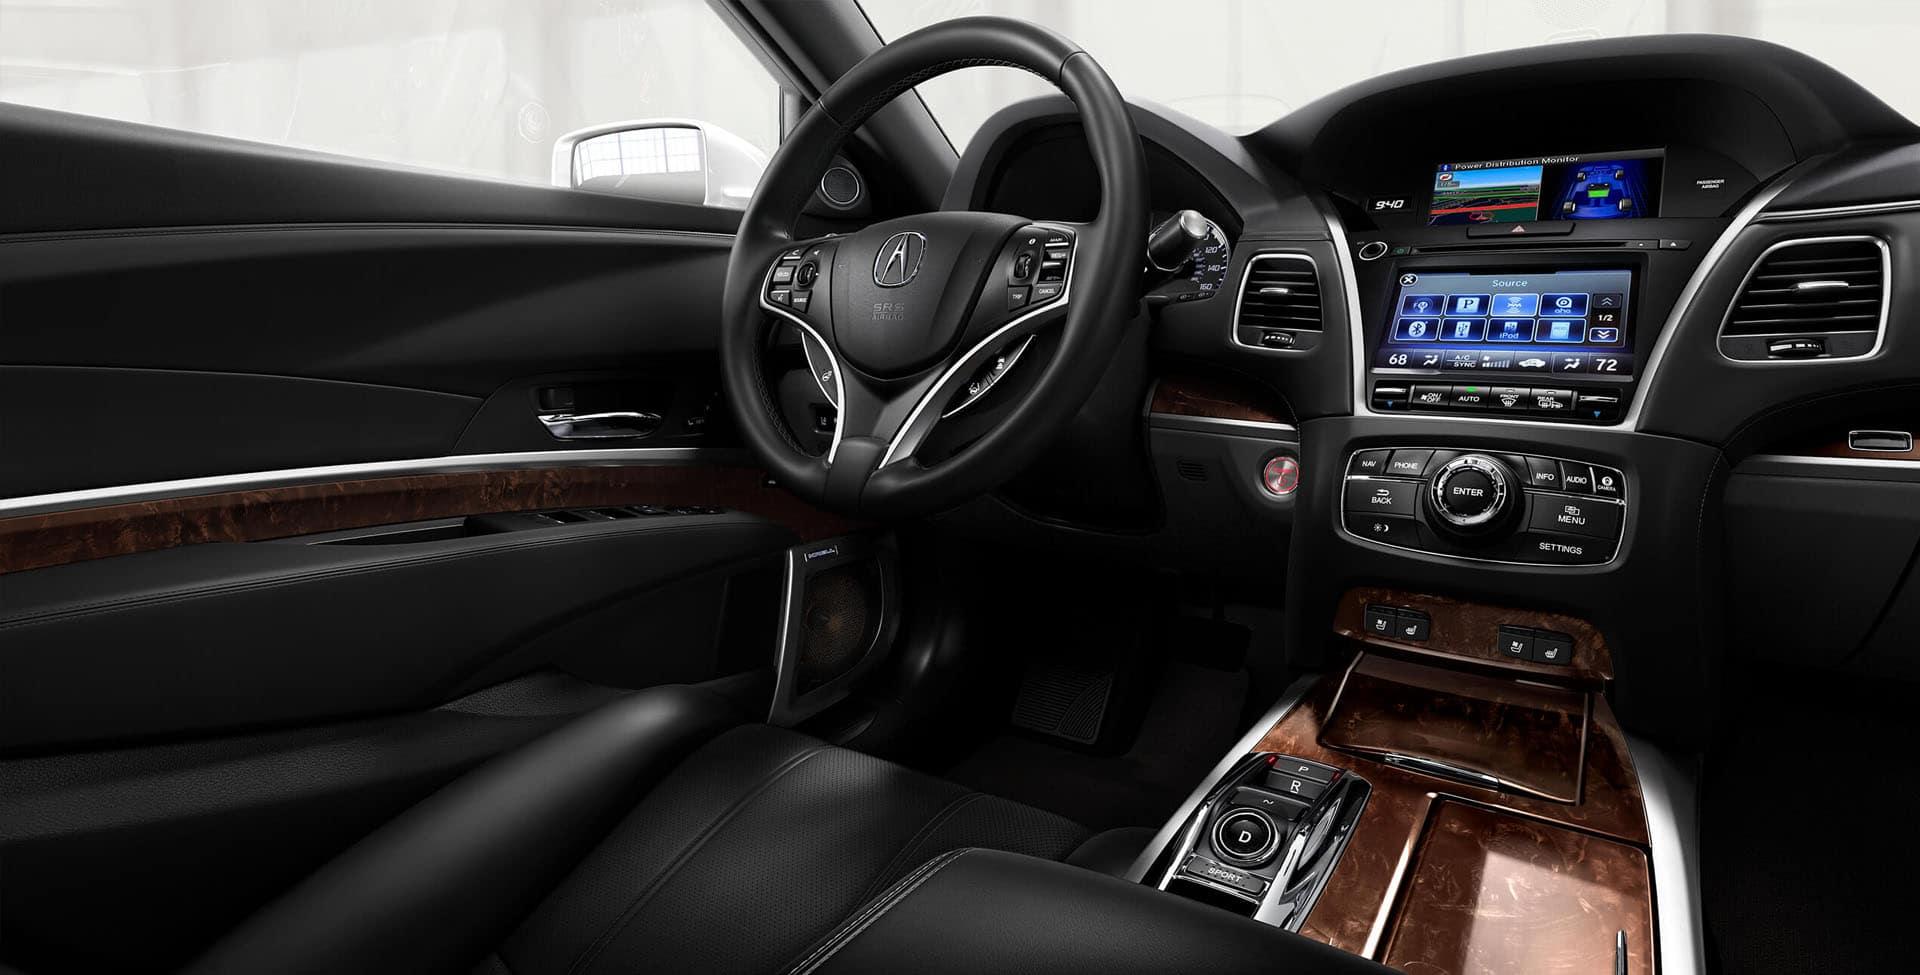 Acura RLX interior